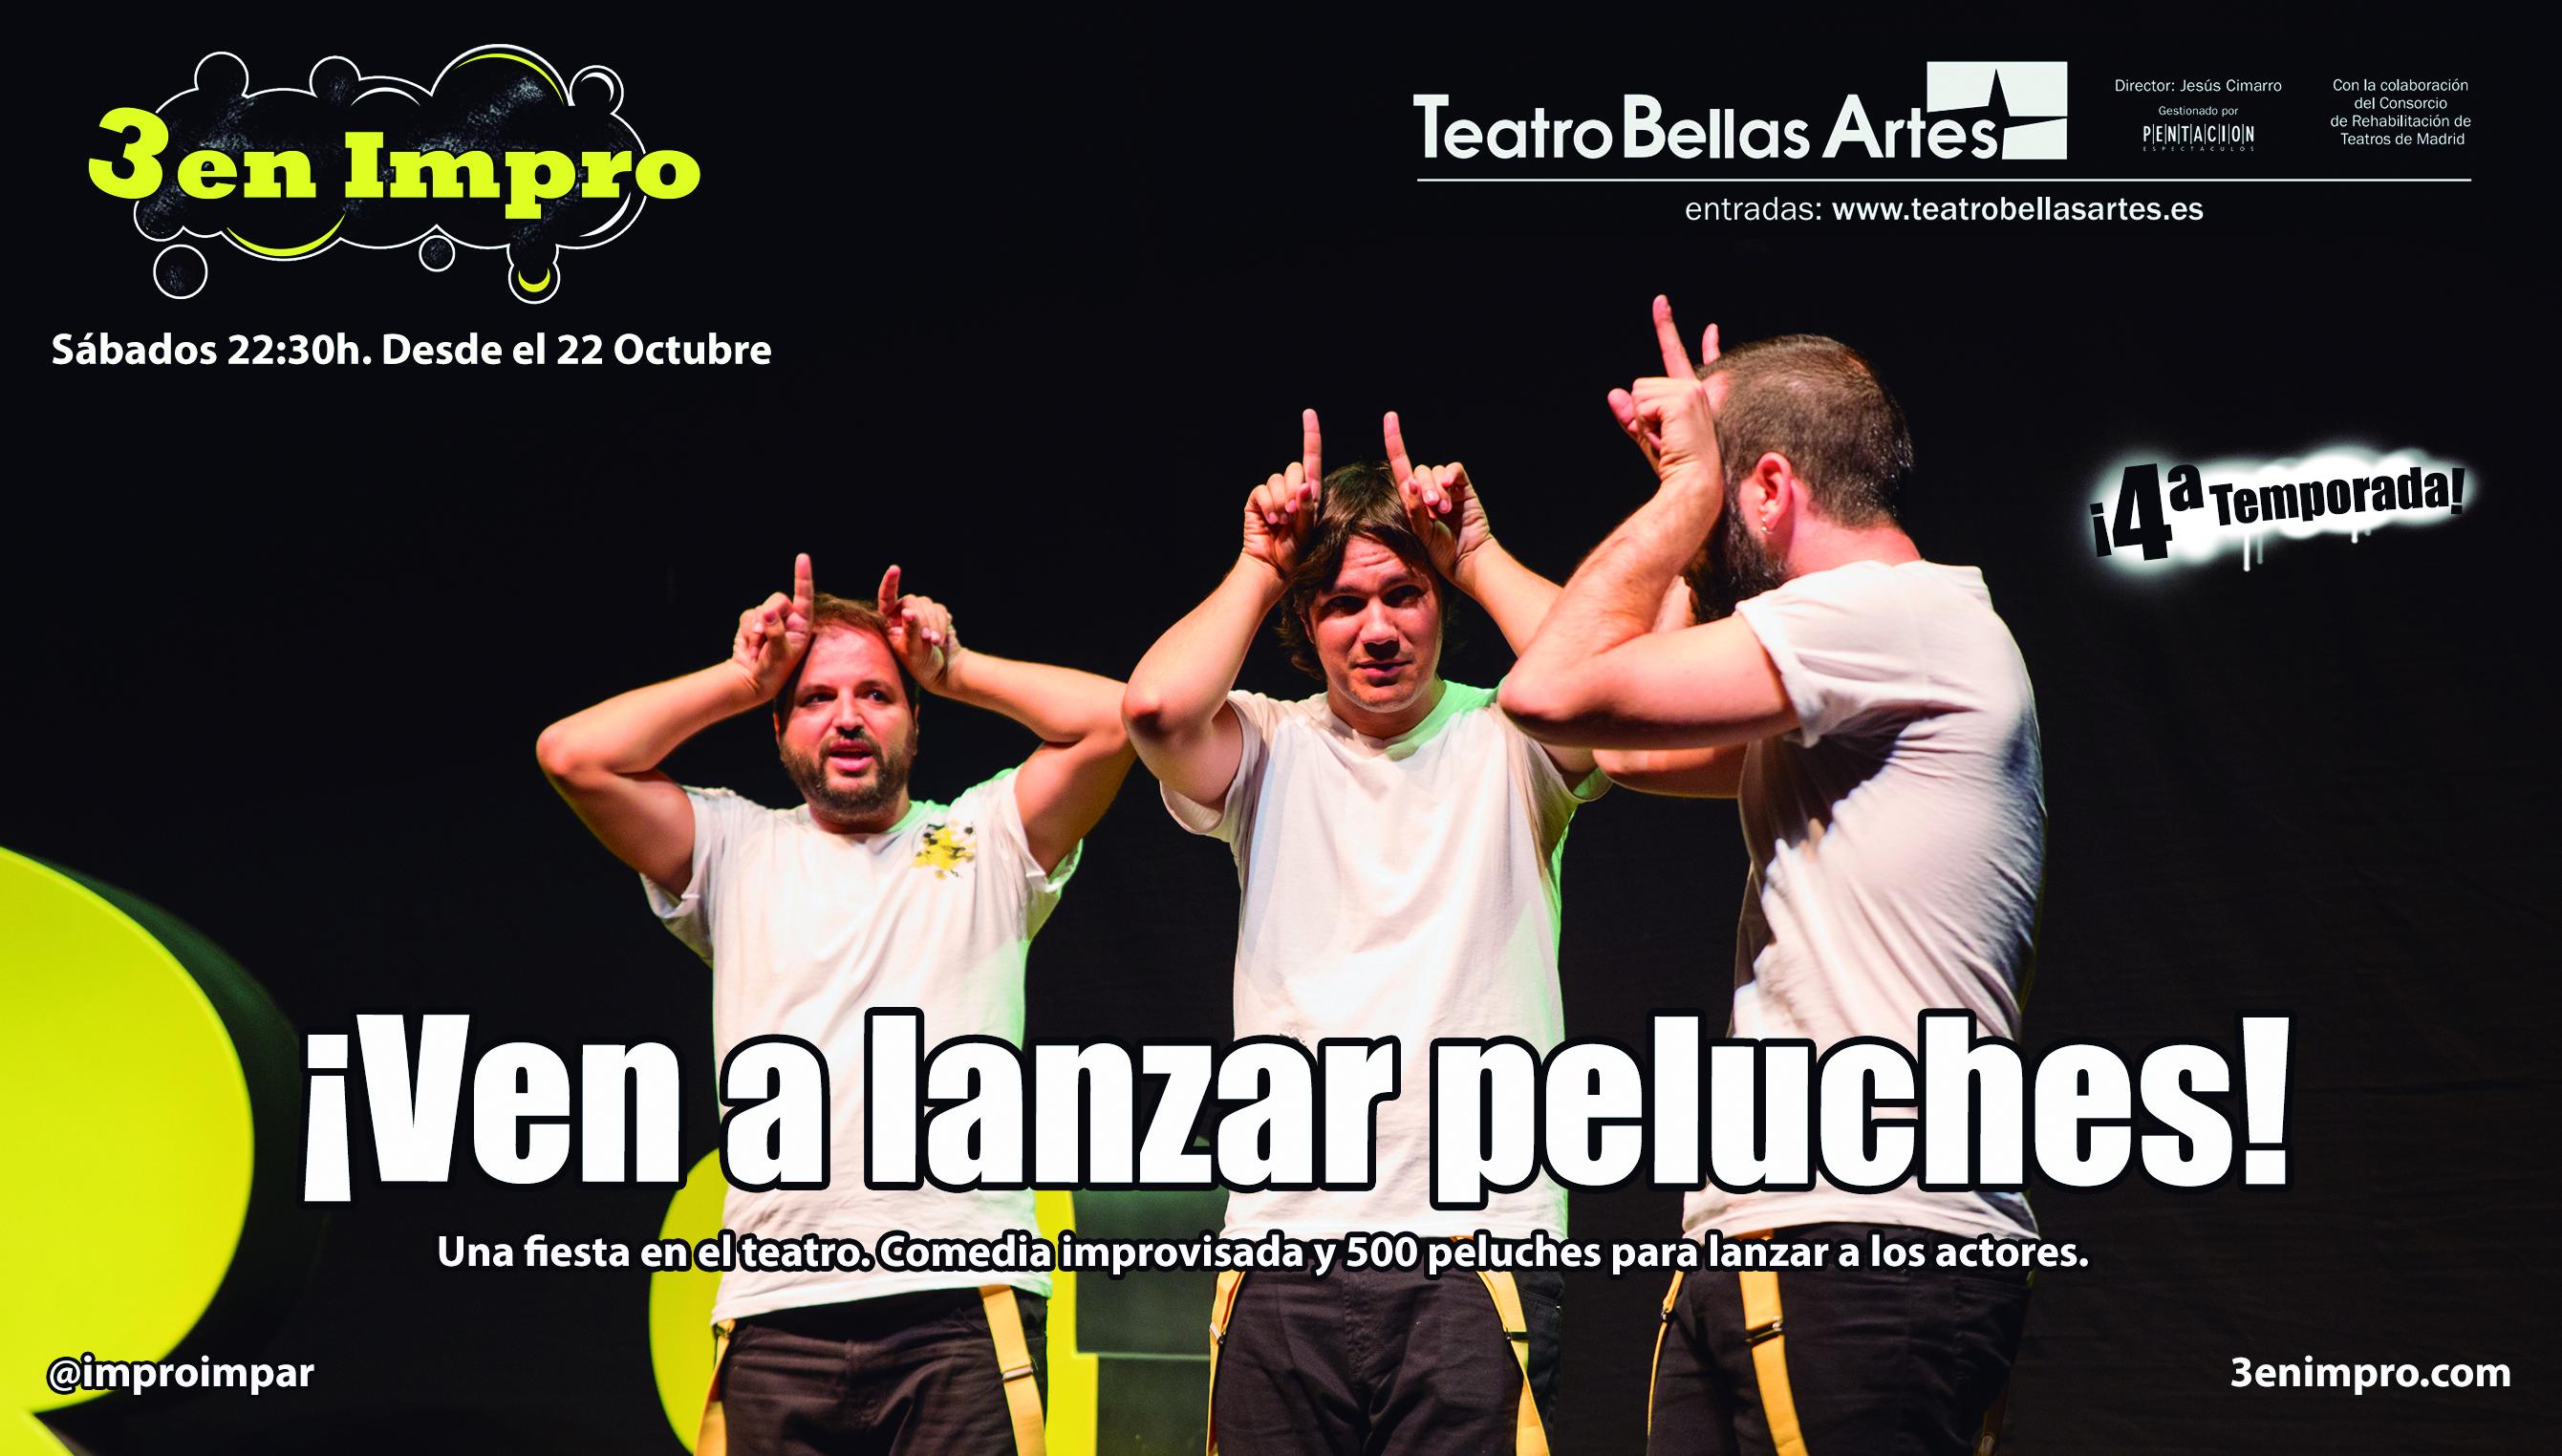 Teatro 3enimpro